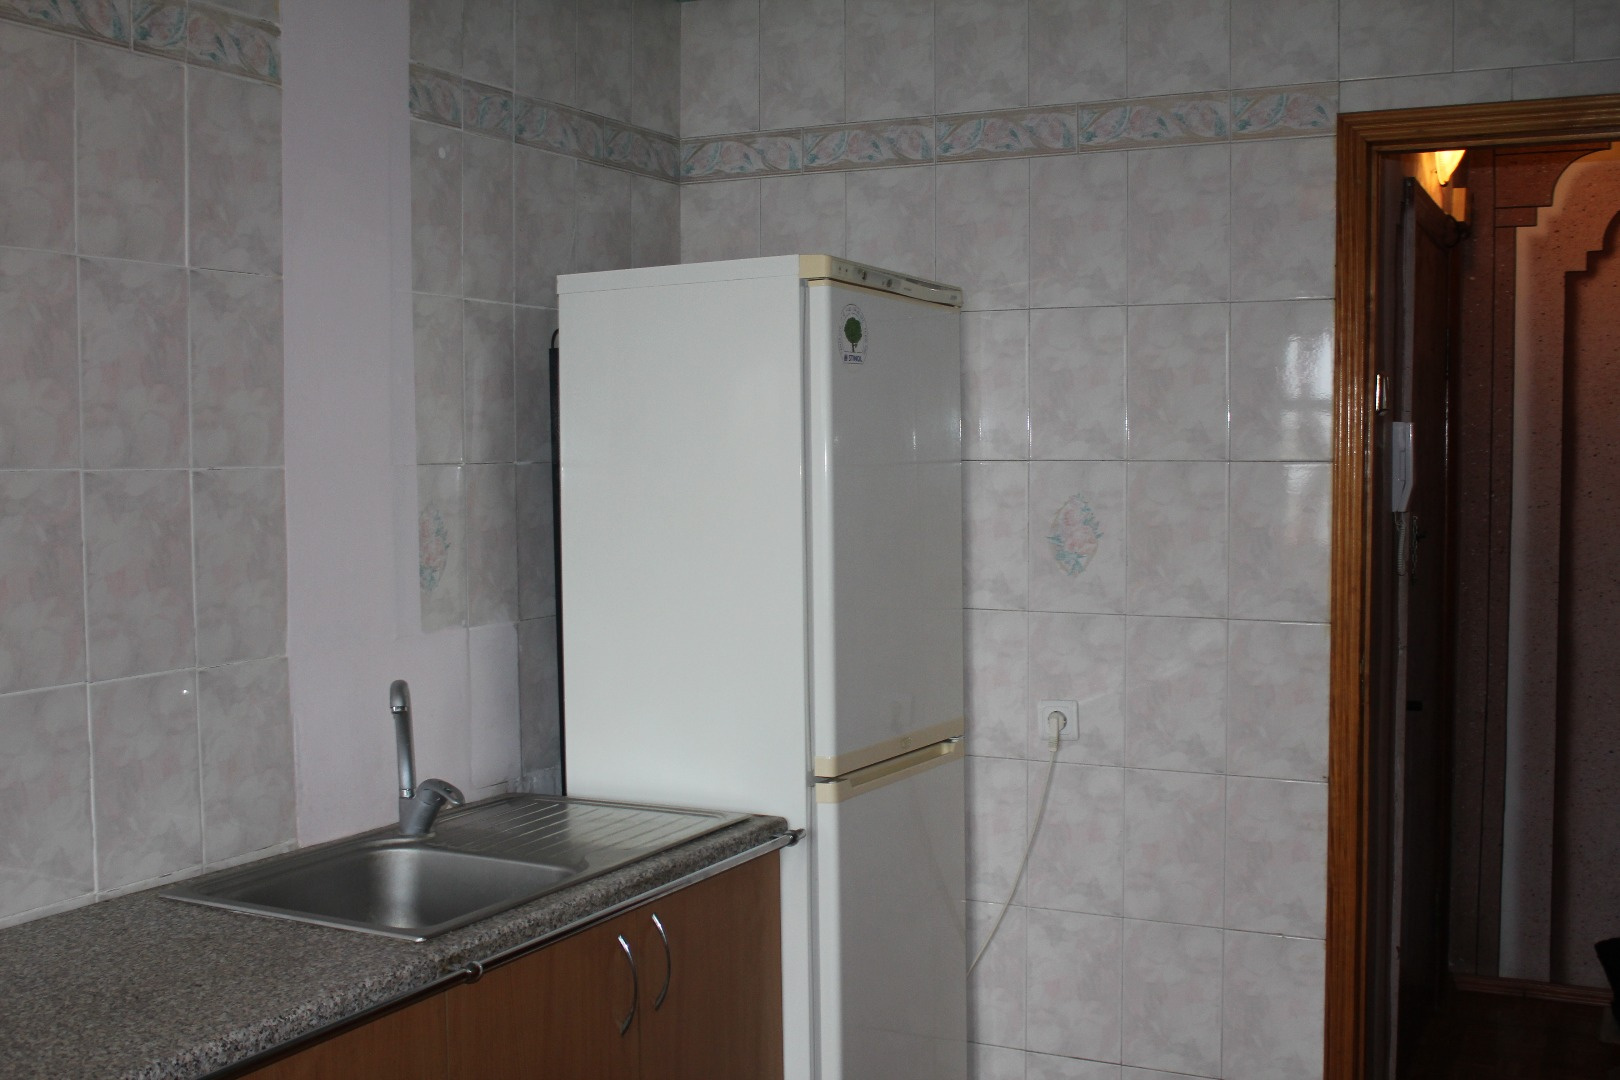 Продается 4-комнатная Квартира на ул. Спортивная (Гайдара) — 53 000 у.е. (фото №3)